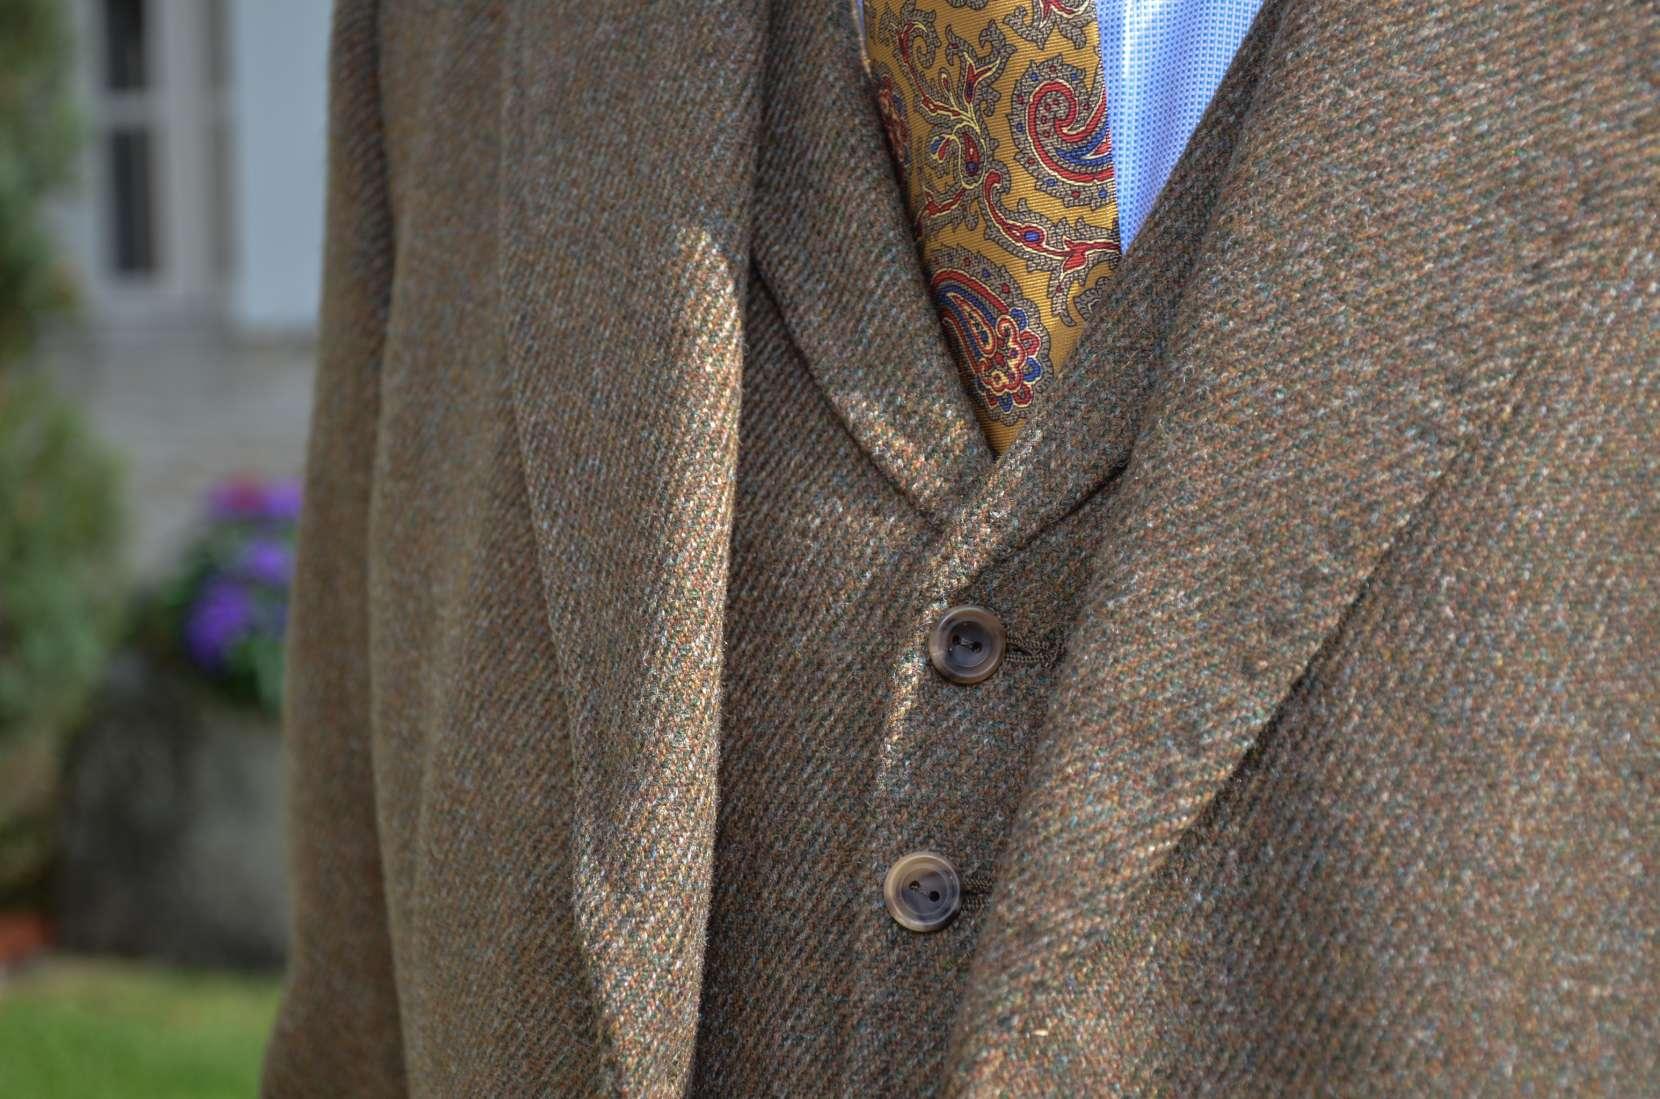 Garment-08-Shooting-Suit-0163-1660x1099.jpg